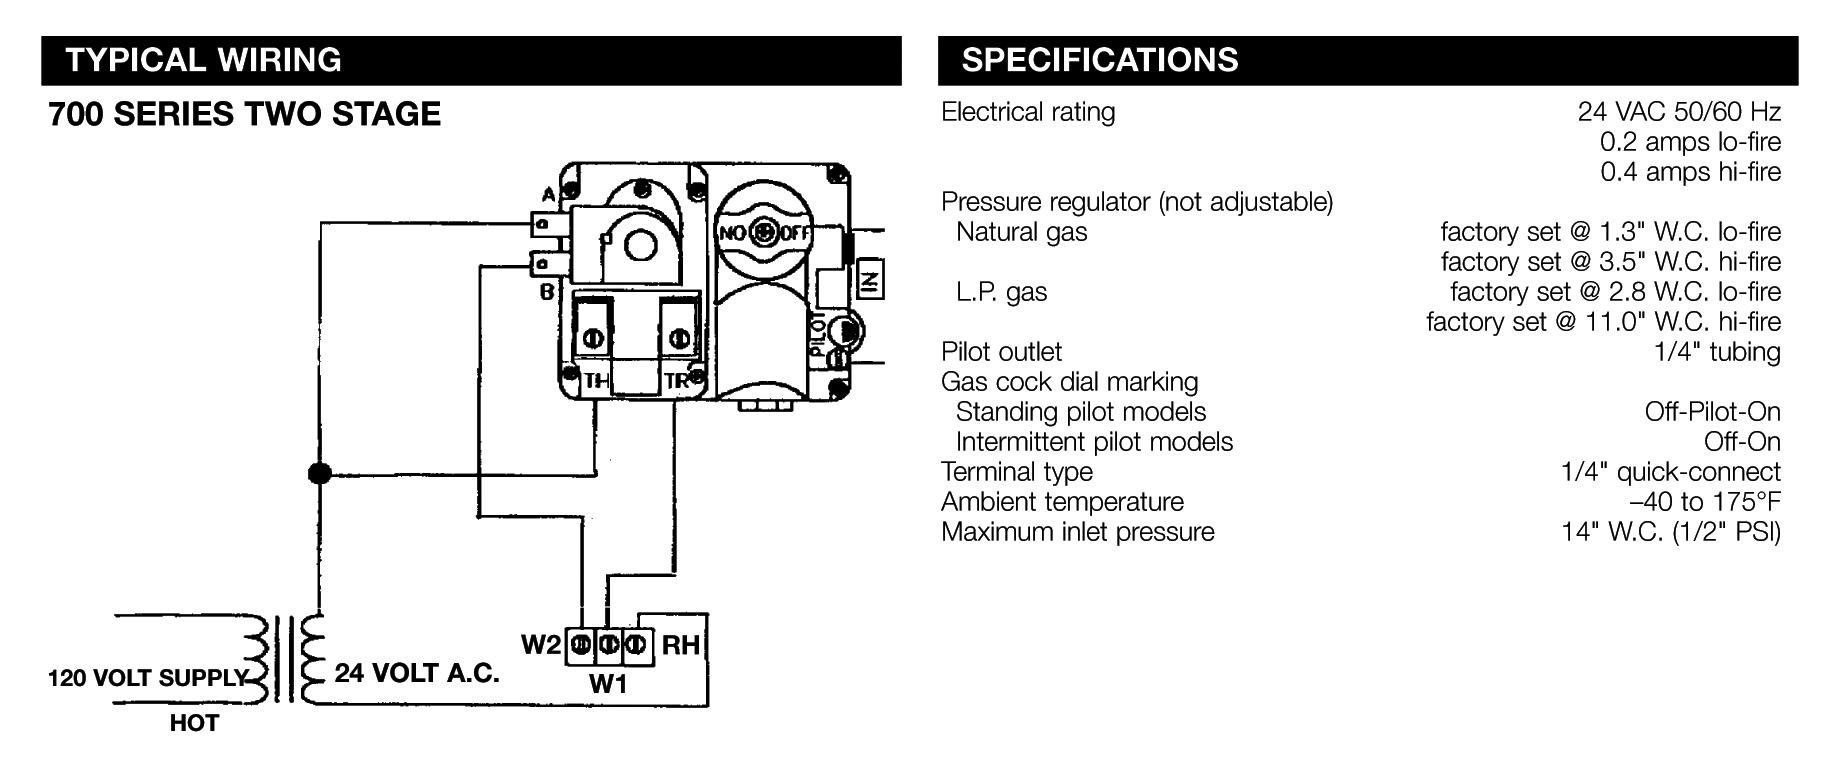 787cc71d fa10 4f03 824b c5b9bcc9b3d8?resize=665%2C281&ssl=1 gas valve wiring diagram robertshaw wiring diagram Robertshaw Gas Valve 710 502 at bayanpartner.co